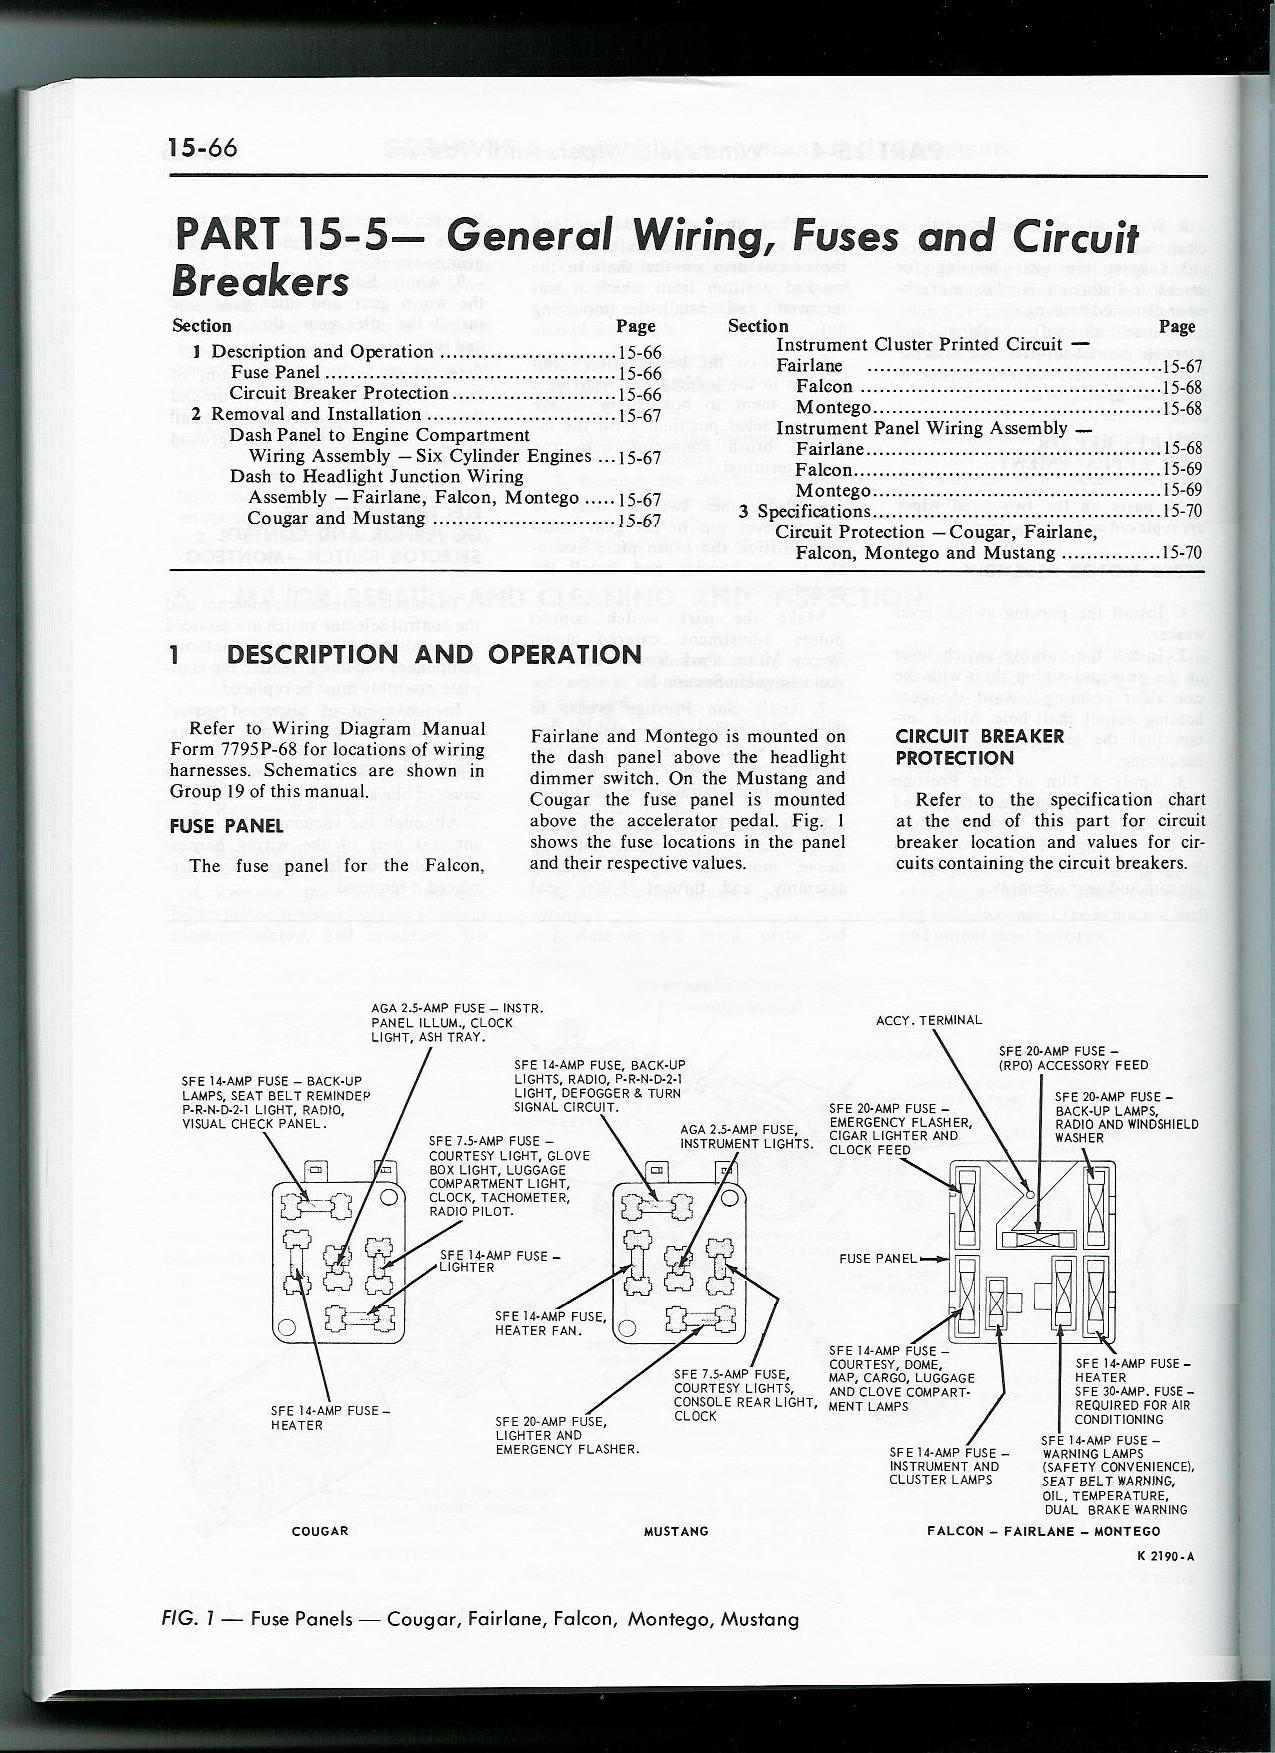 Cool 1966 Mustang Fuse Box Wiring Diagram Diagram Mx Tl Wiring Cloud Itislusmarecoveryedborg